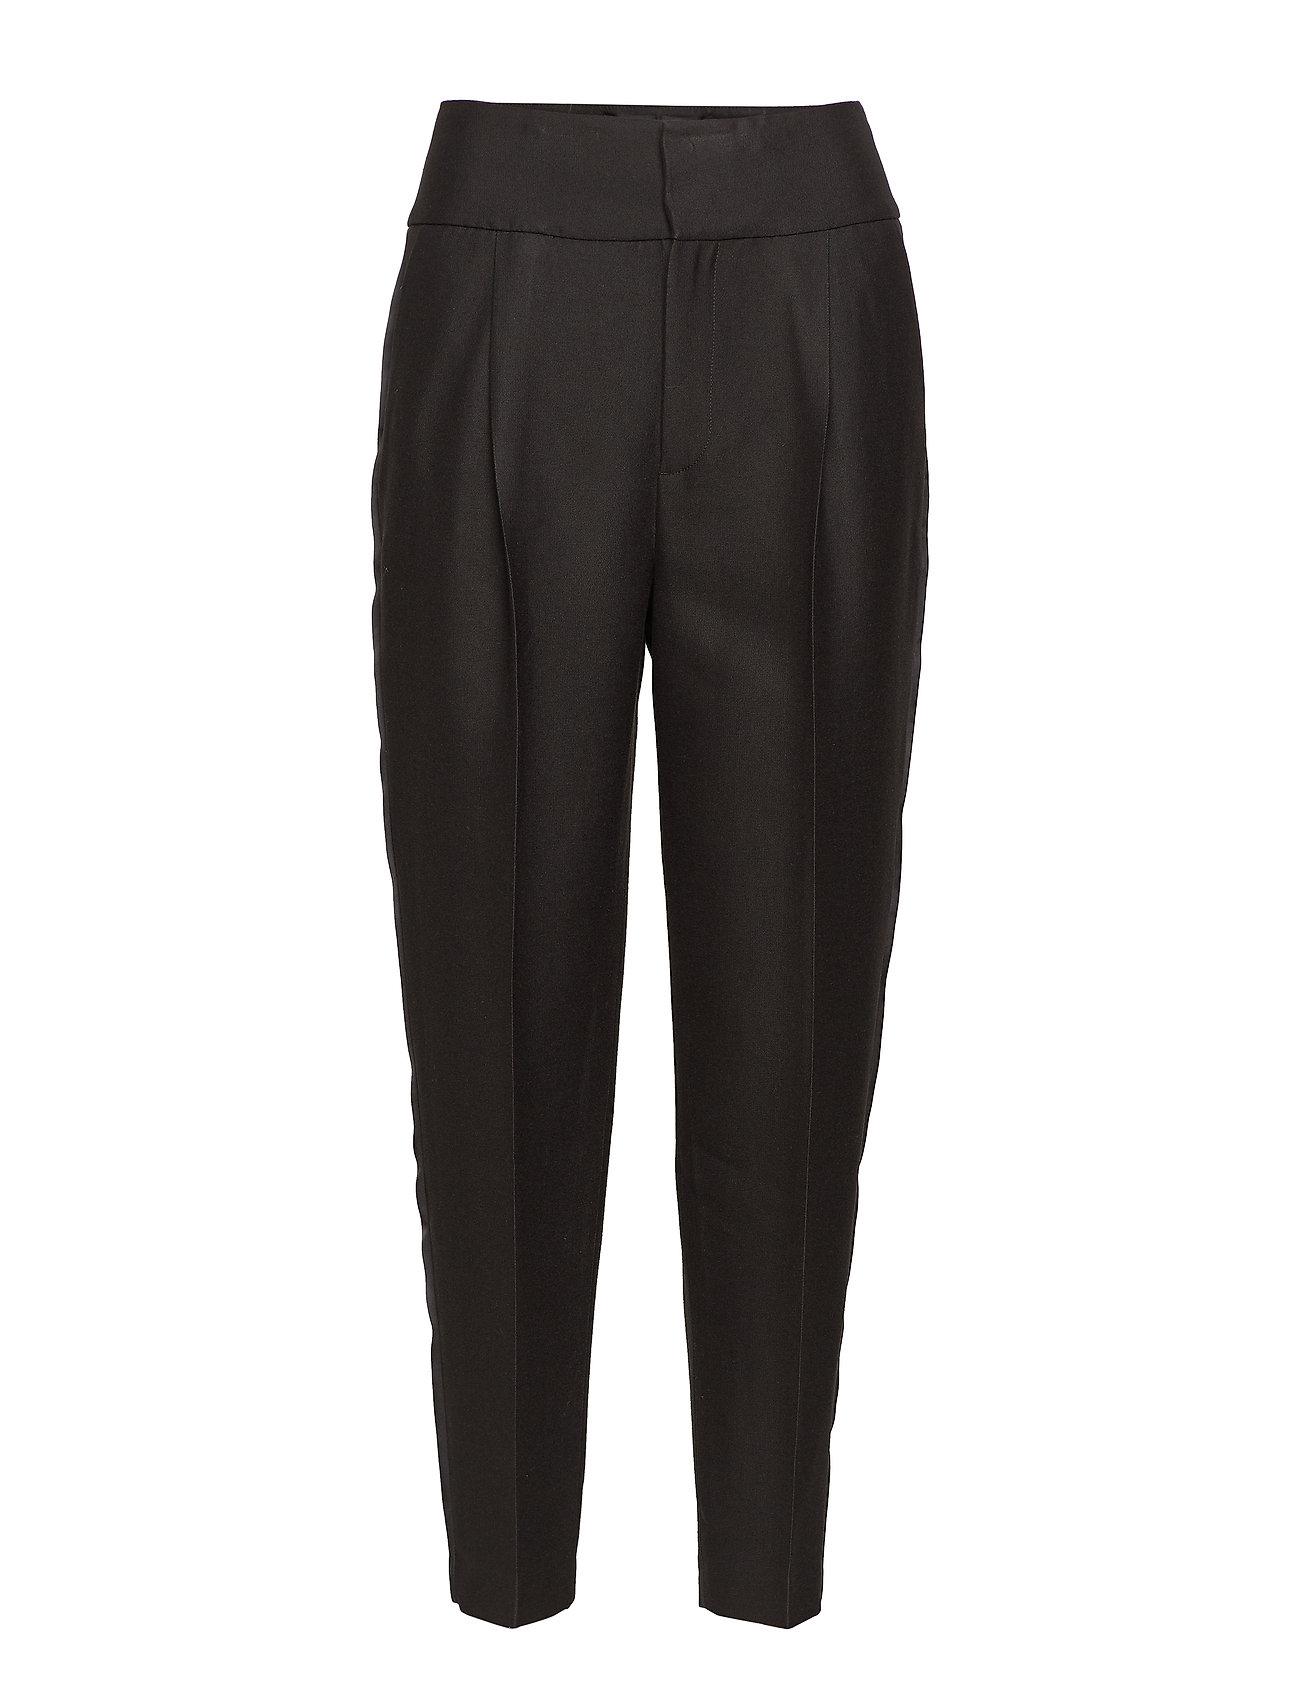 Filippa K Kylie Trousers - BLACK